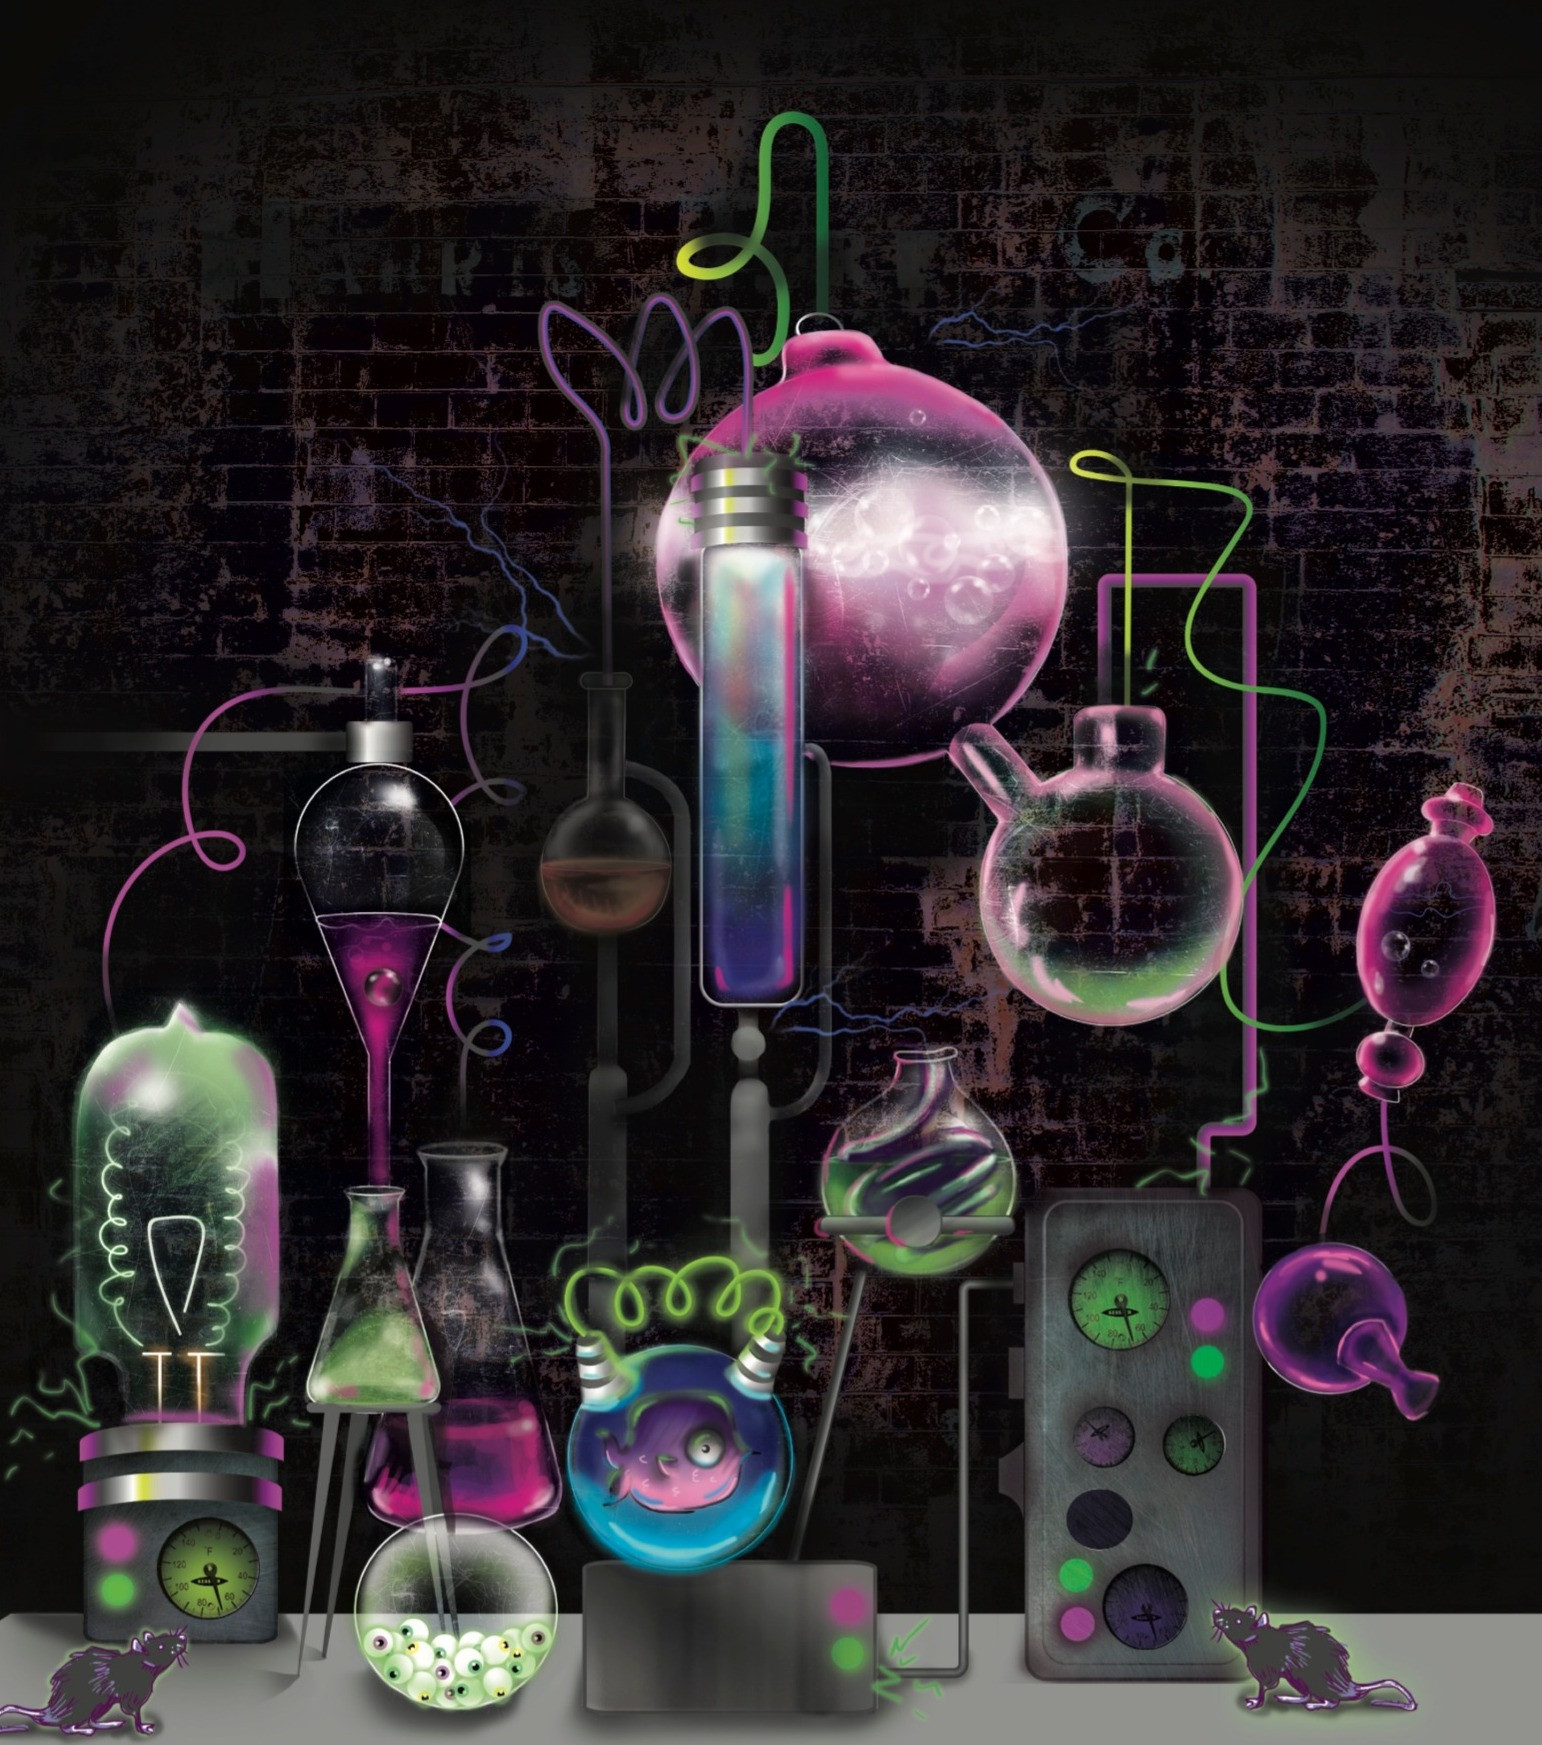 Mad Scientist Digital Art Concept For Halloween